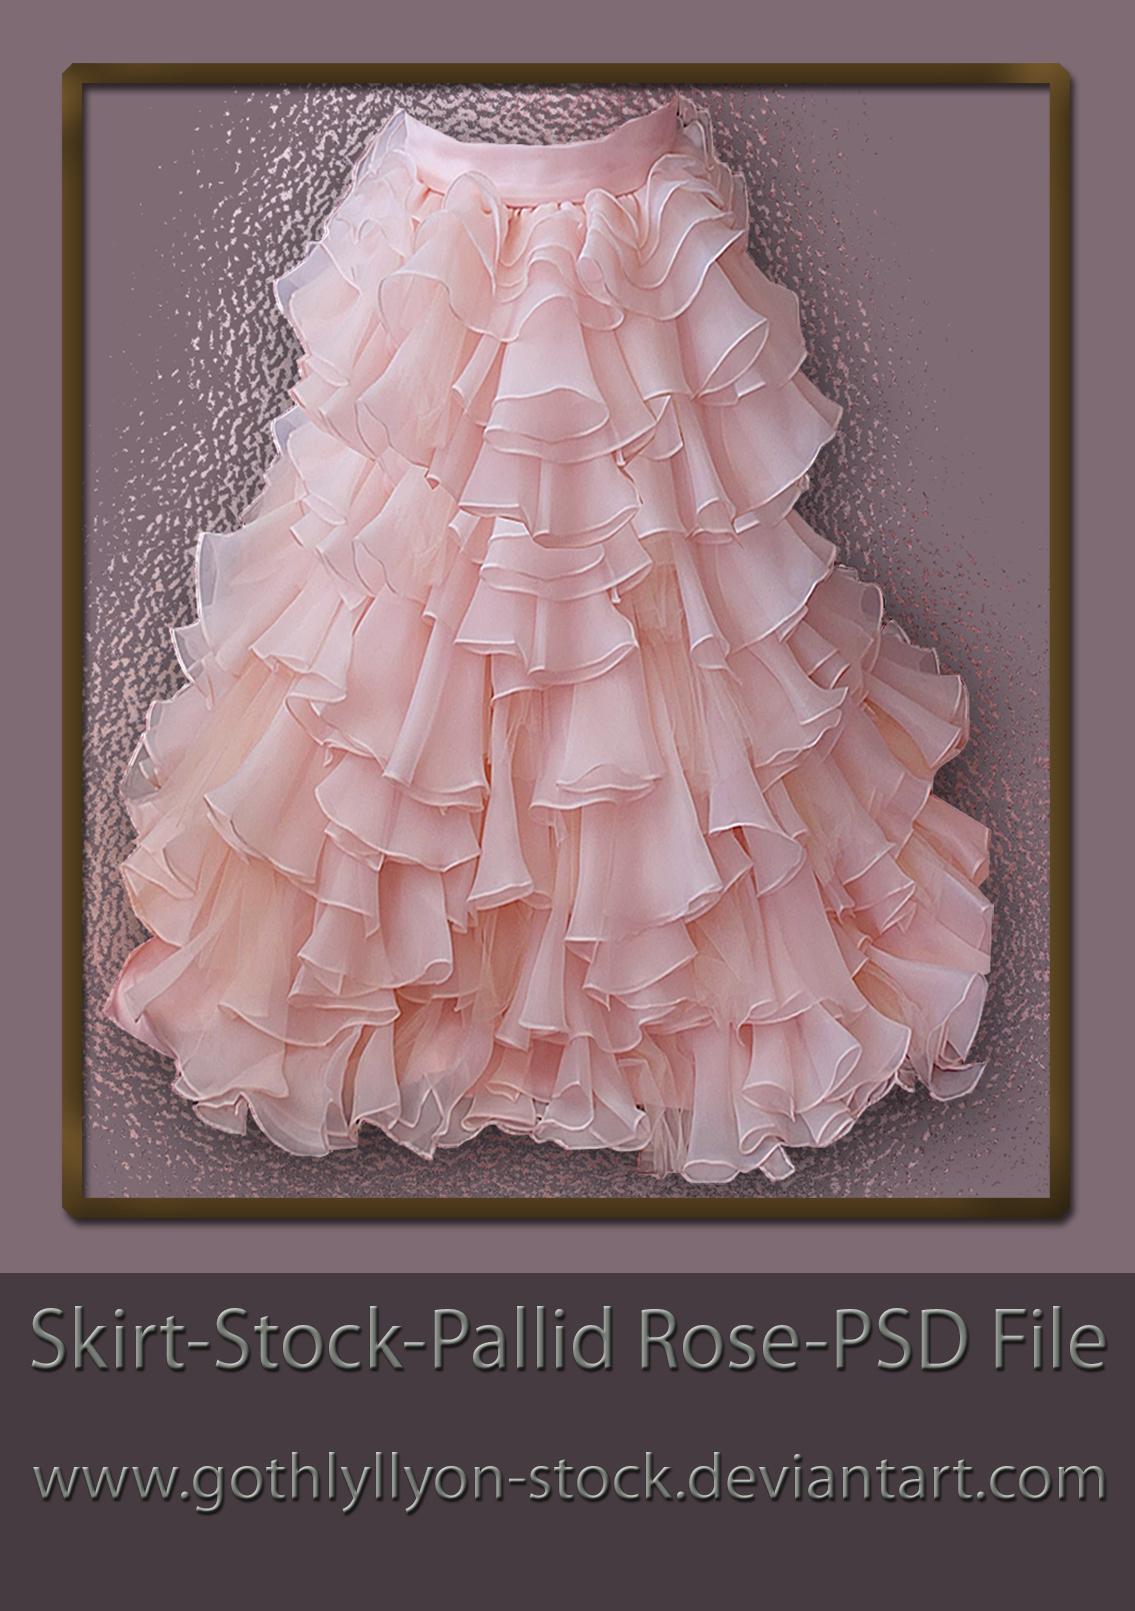 Stock-Skirt-Pallid Rose by GothLyllyOn-Sotck